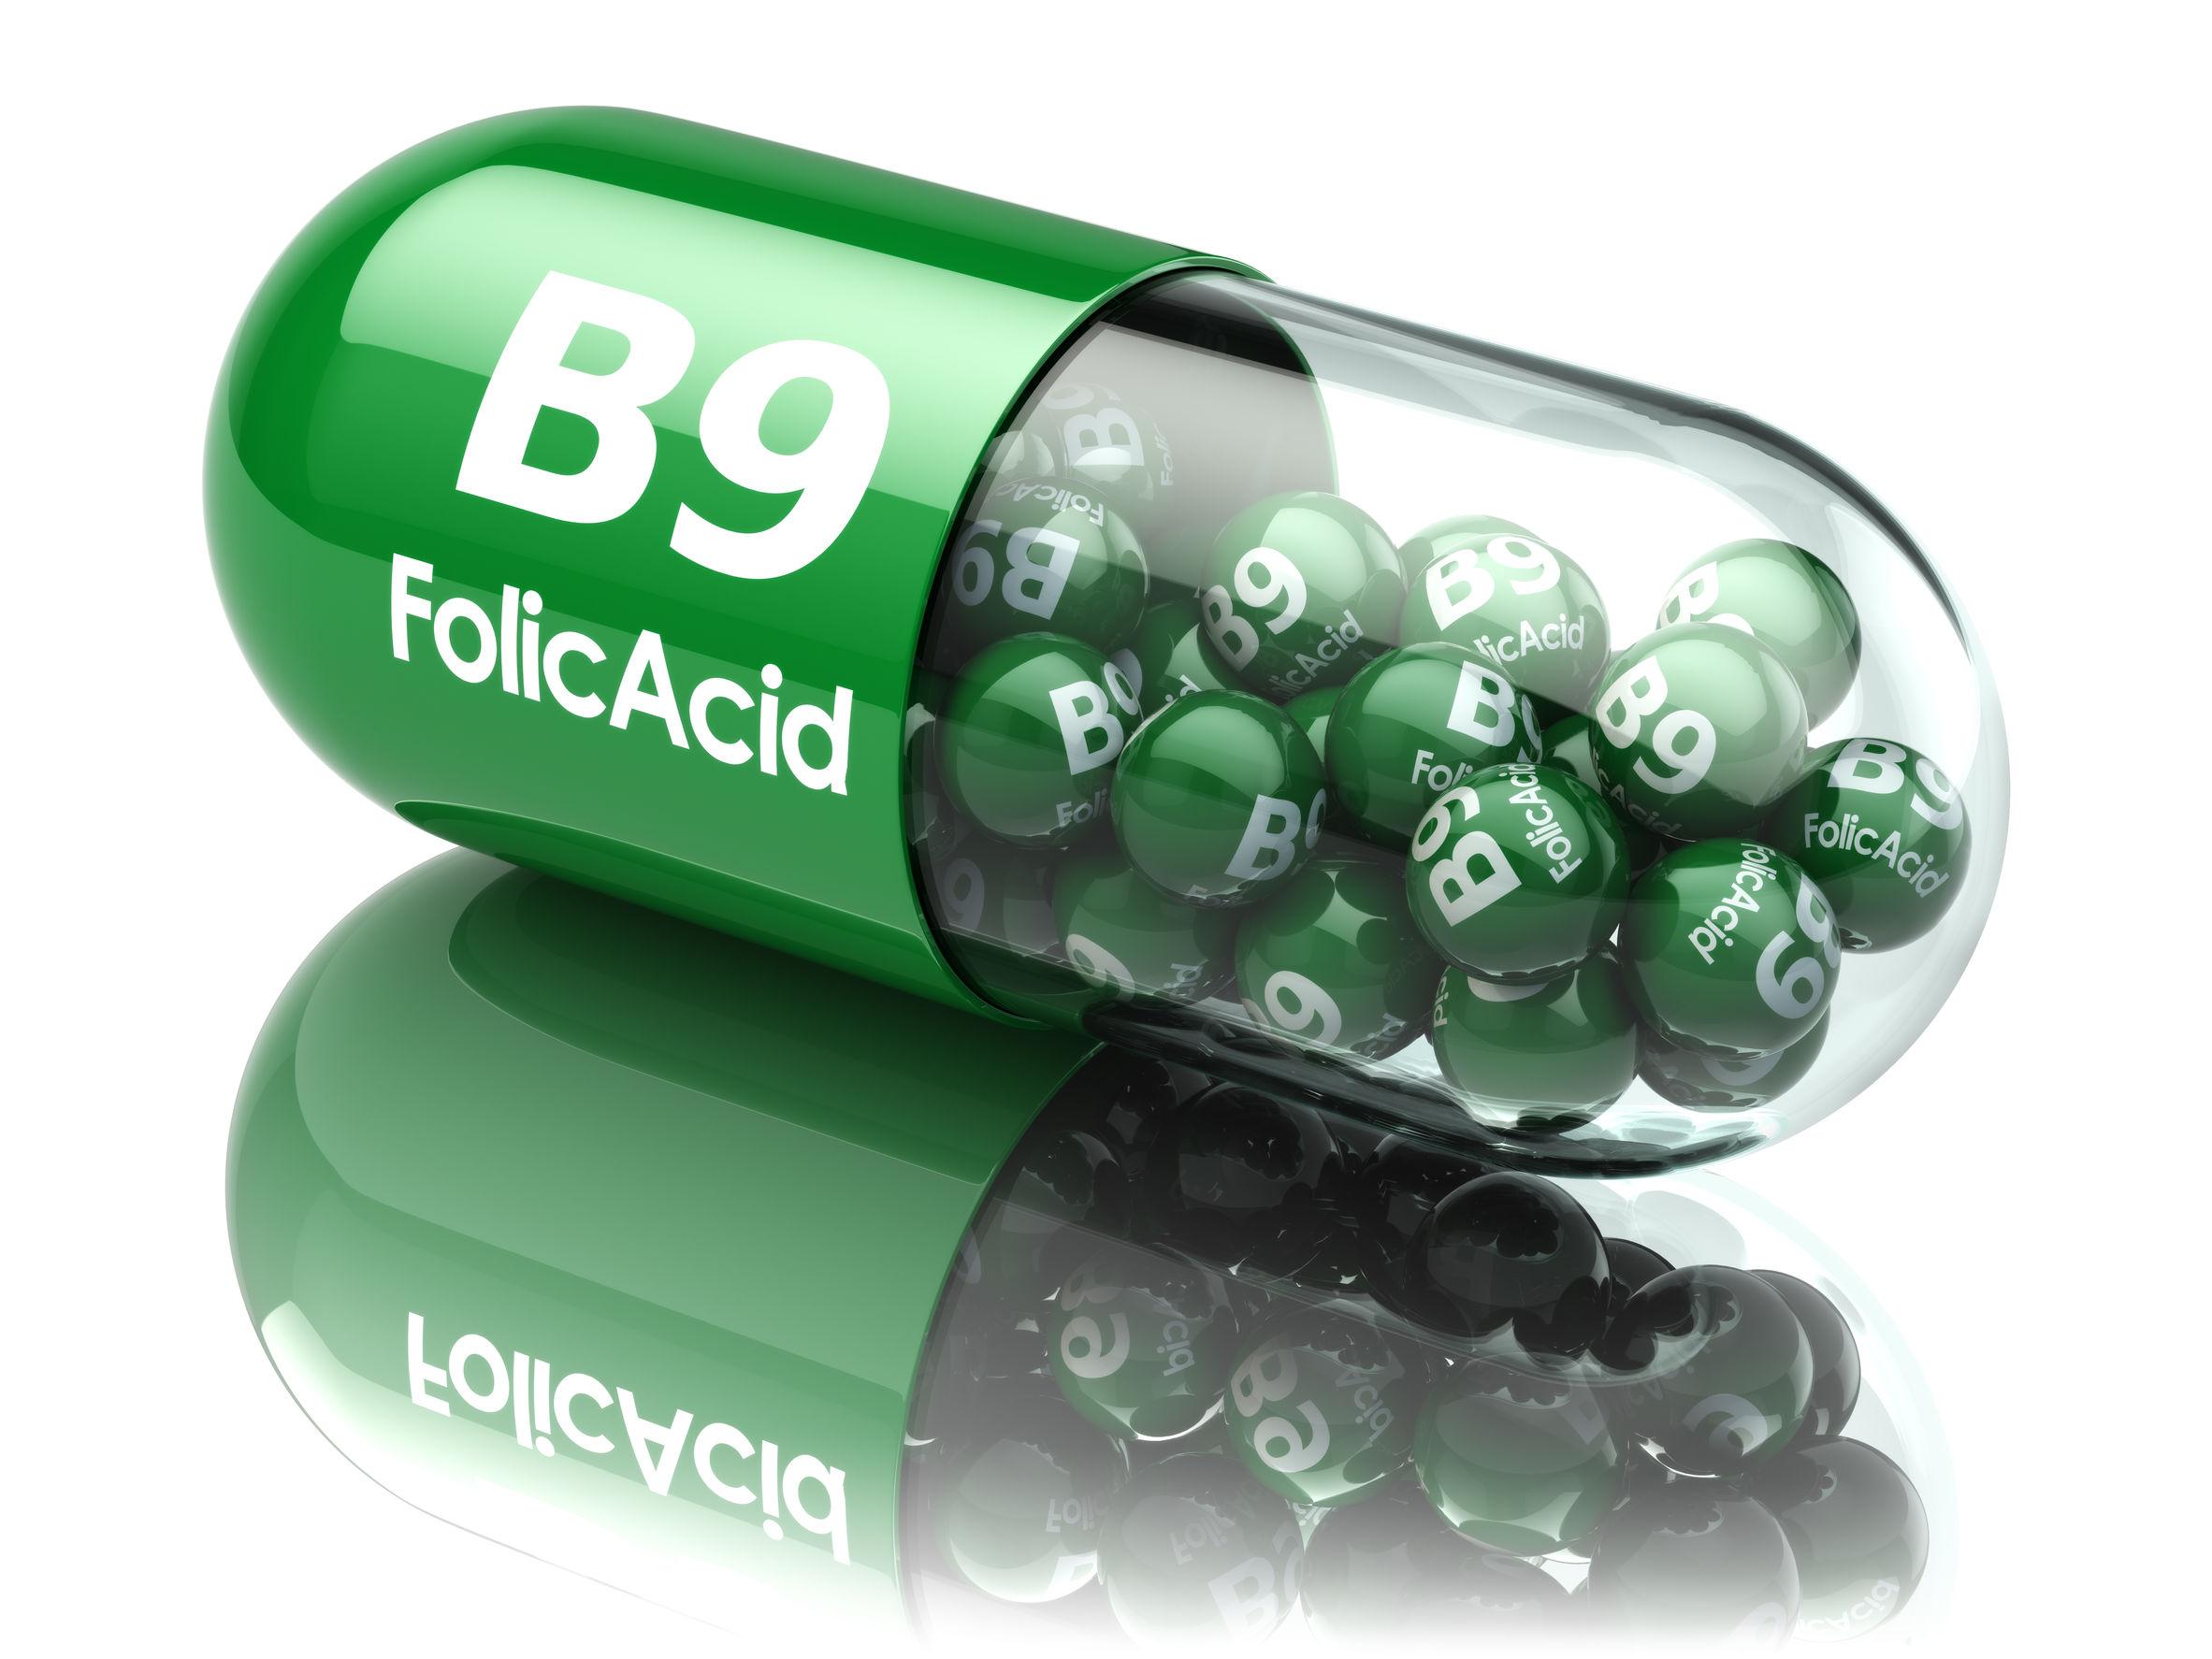 47531853 - pills with b9 folic acid element. dietary supplements. vitamin capsules. 3d